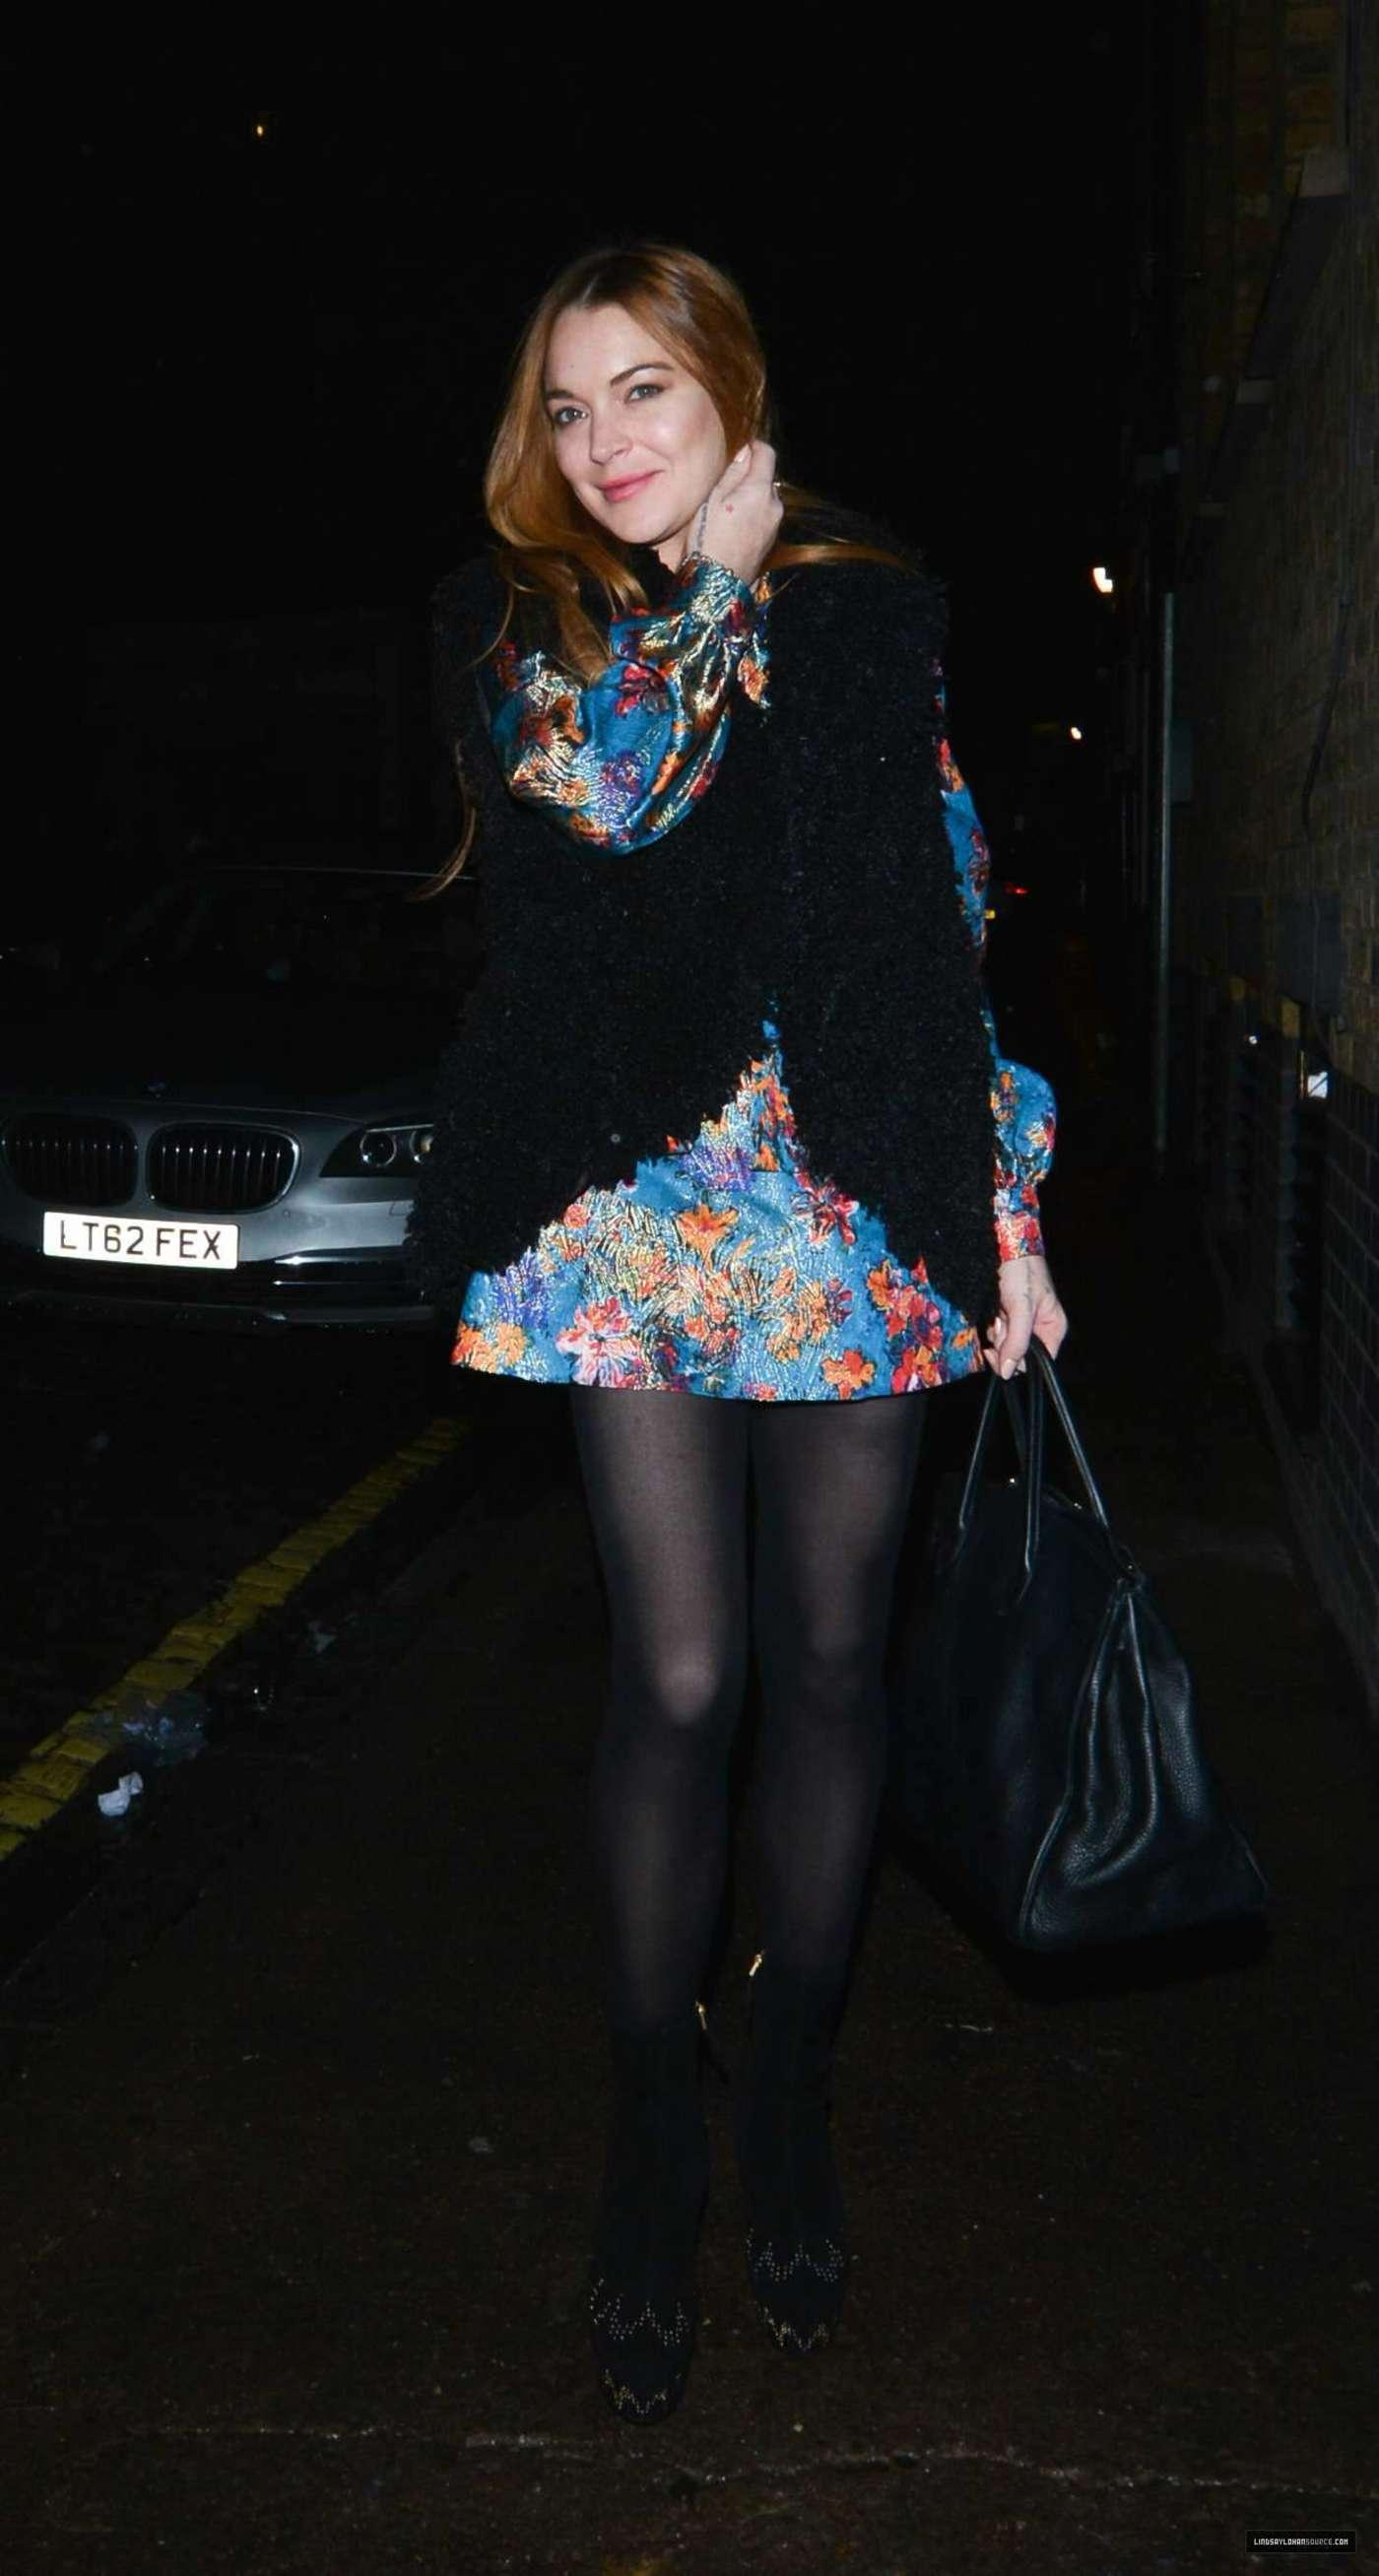 Lindsay Lohan 2014 : Lindsay Lohan in Mini Dress Leaves the Chiltern Firehouse -18